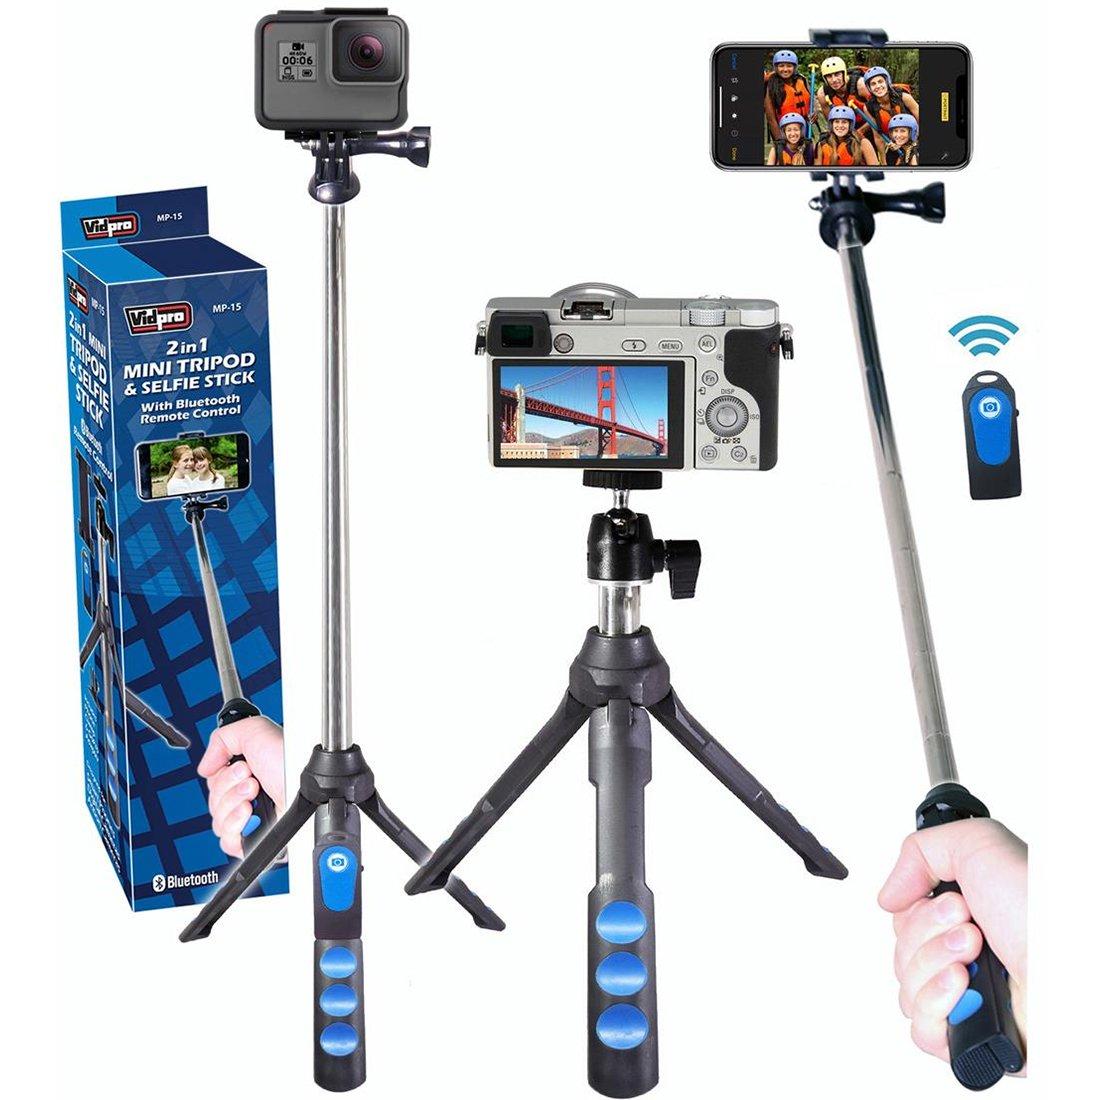 Vidpro mp-15 2イン1ミニ三脚/Selfie Stick with Bluetoothリモートコントロール   B07D82MZ7P